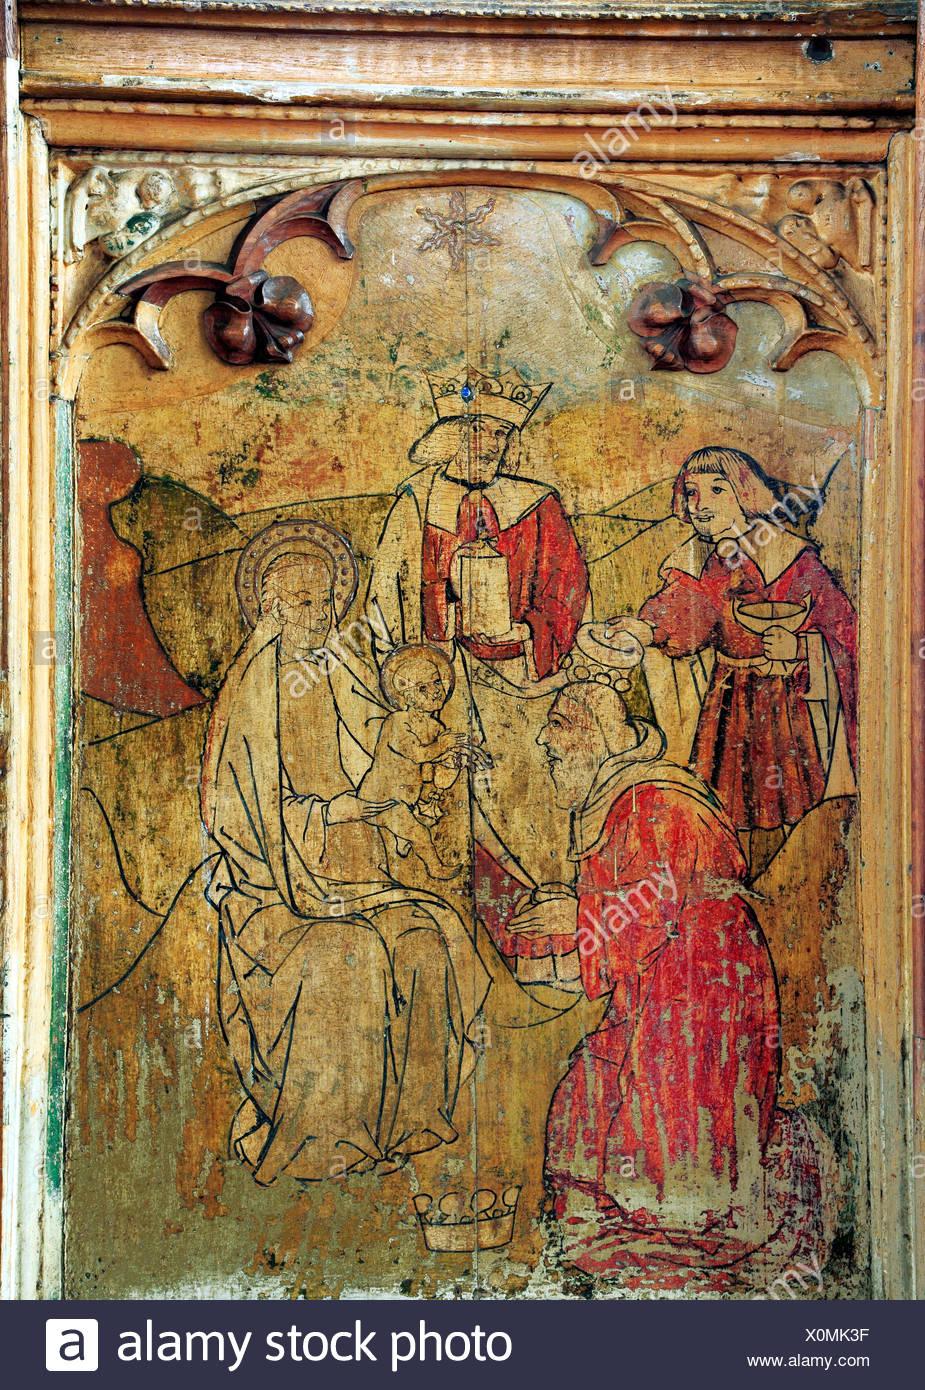 Adoration of the Magi, Three Wise Men, Loddon, Norfolk, medieval rood screen, gifts of gold, frankincense, myrrh, England UK - Stock Image